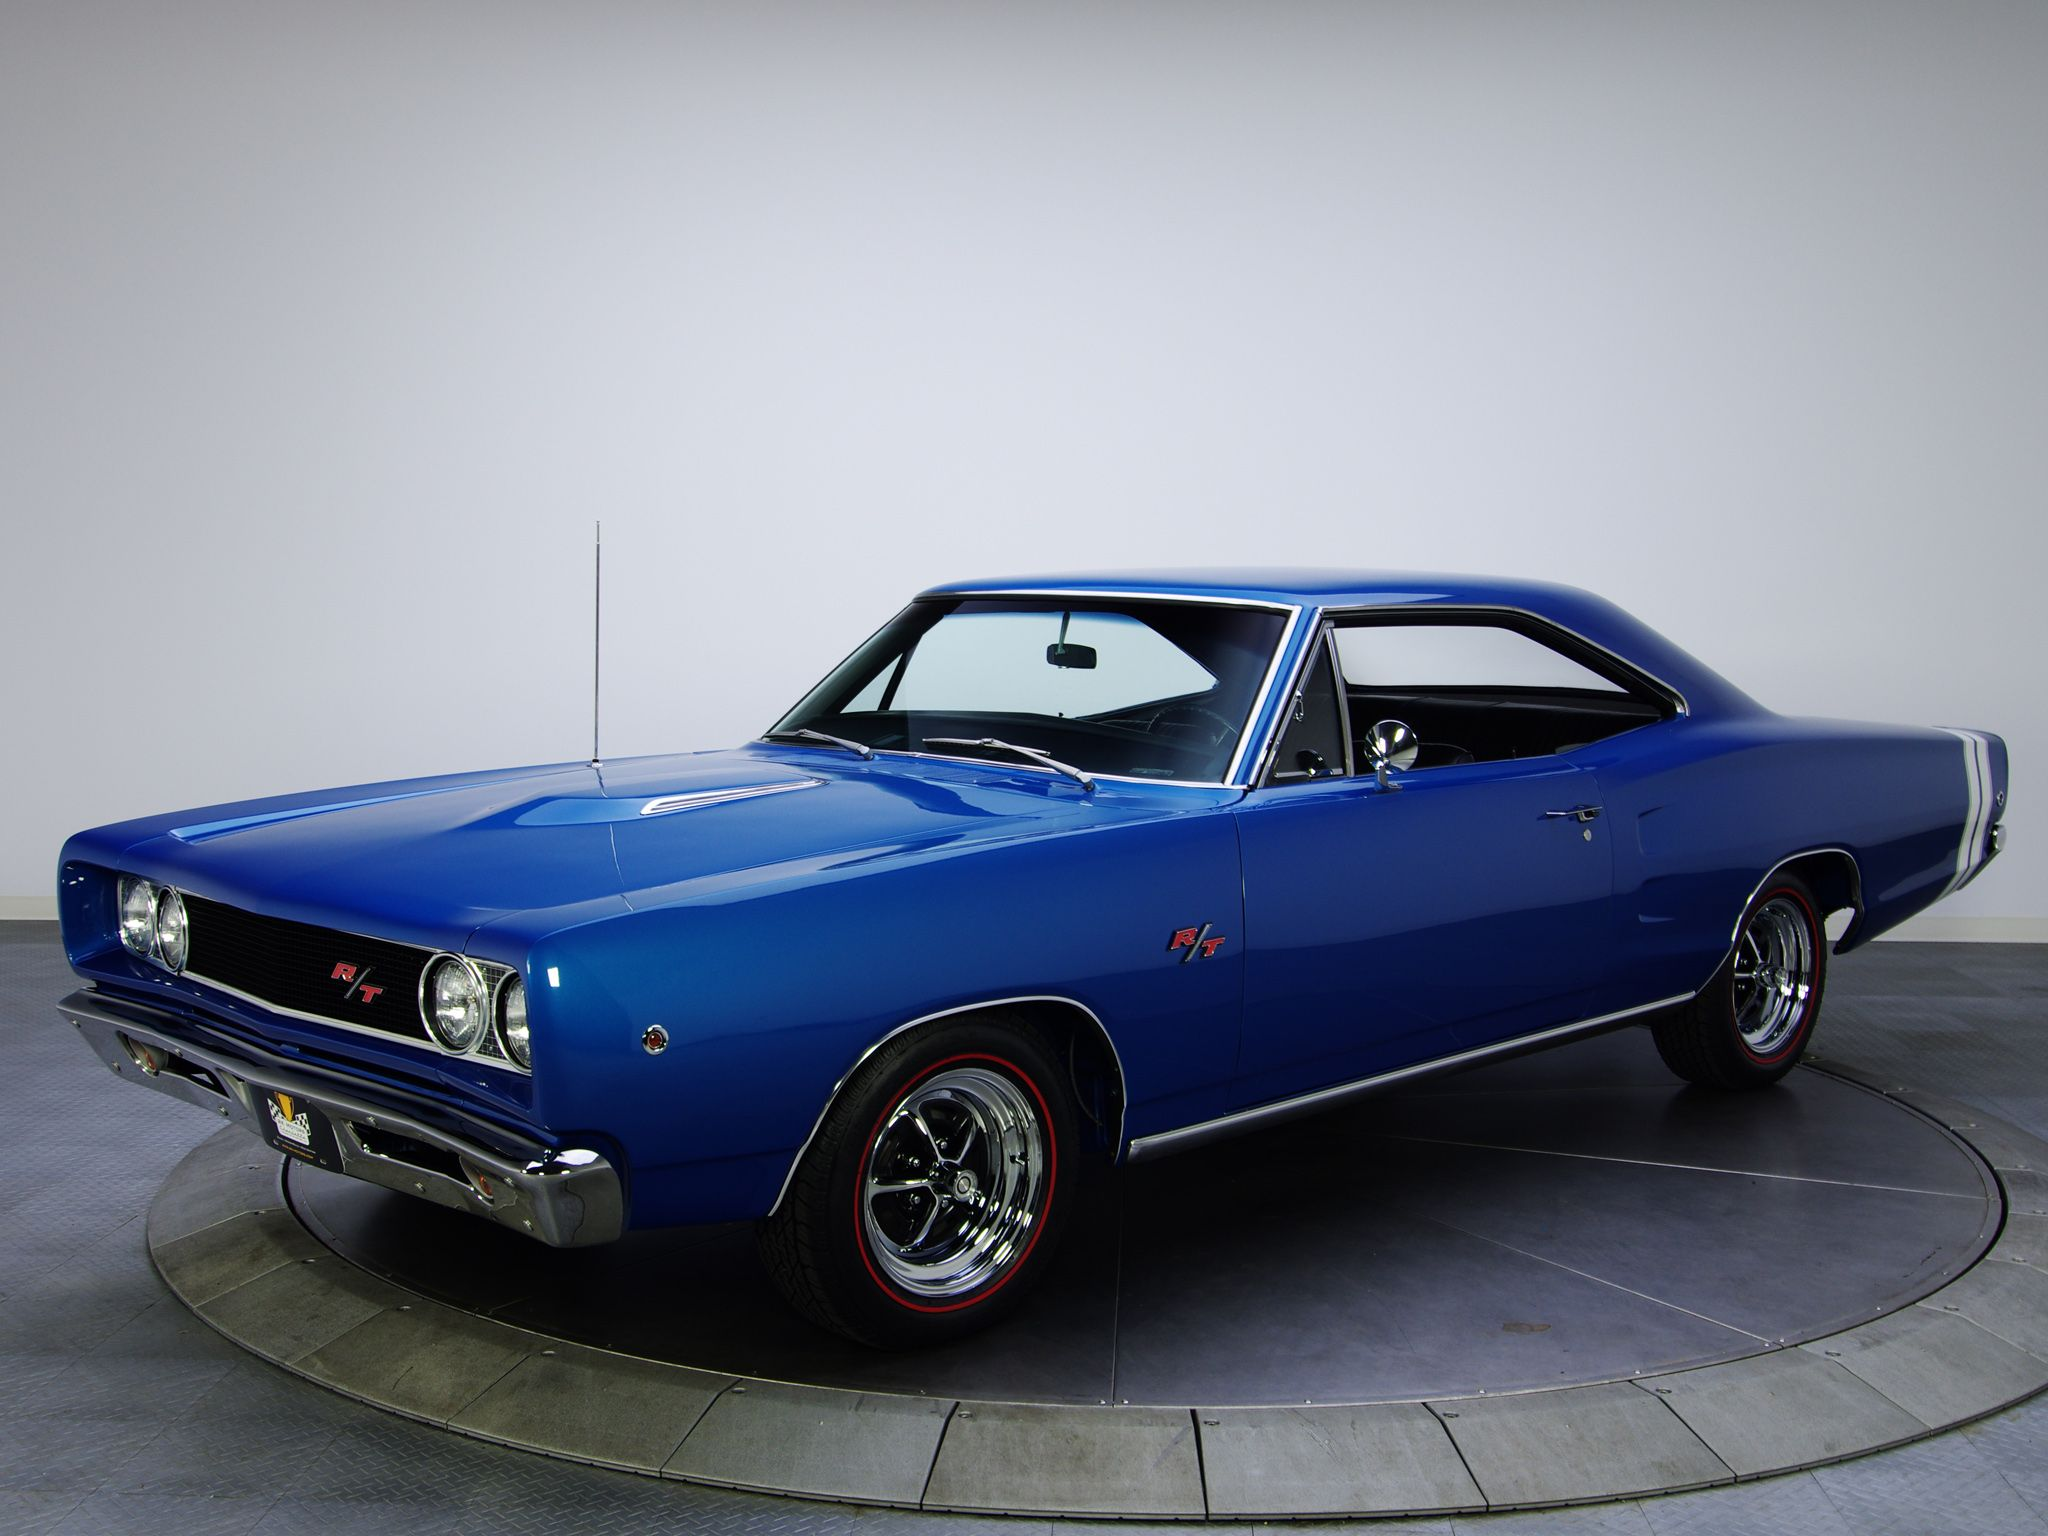 1968 dodge coronet r t hardtop coupe